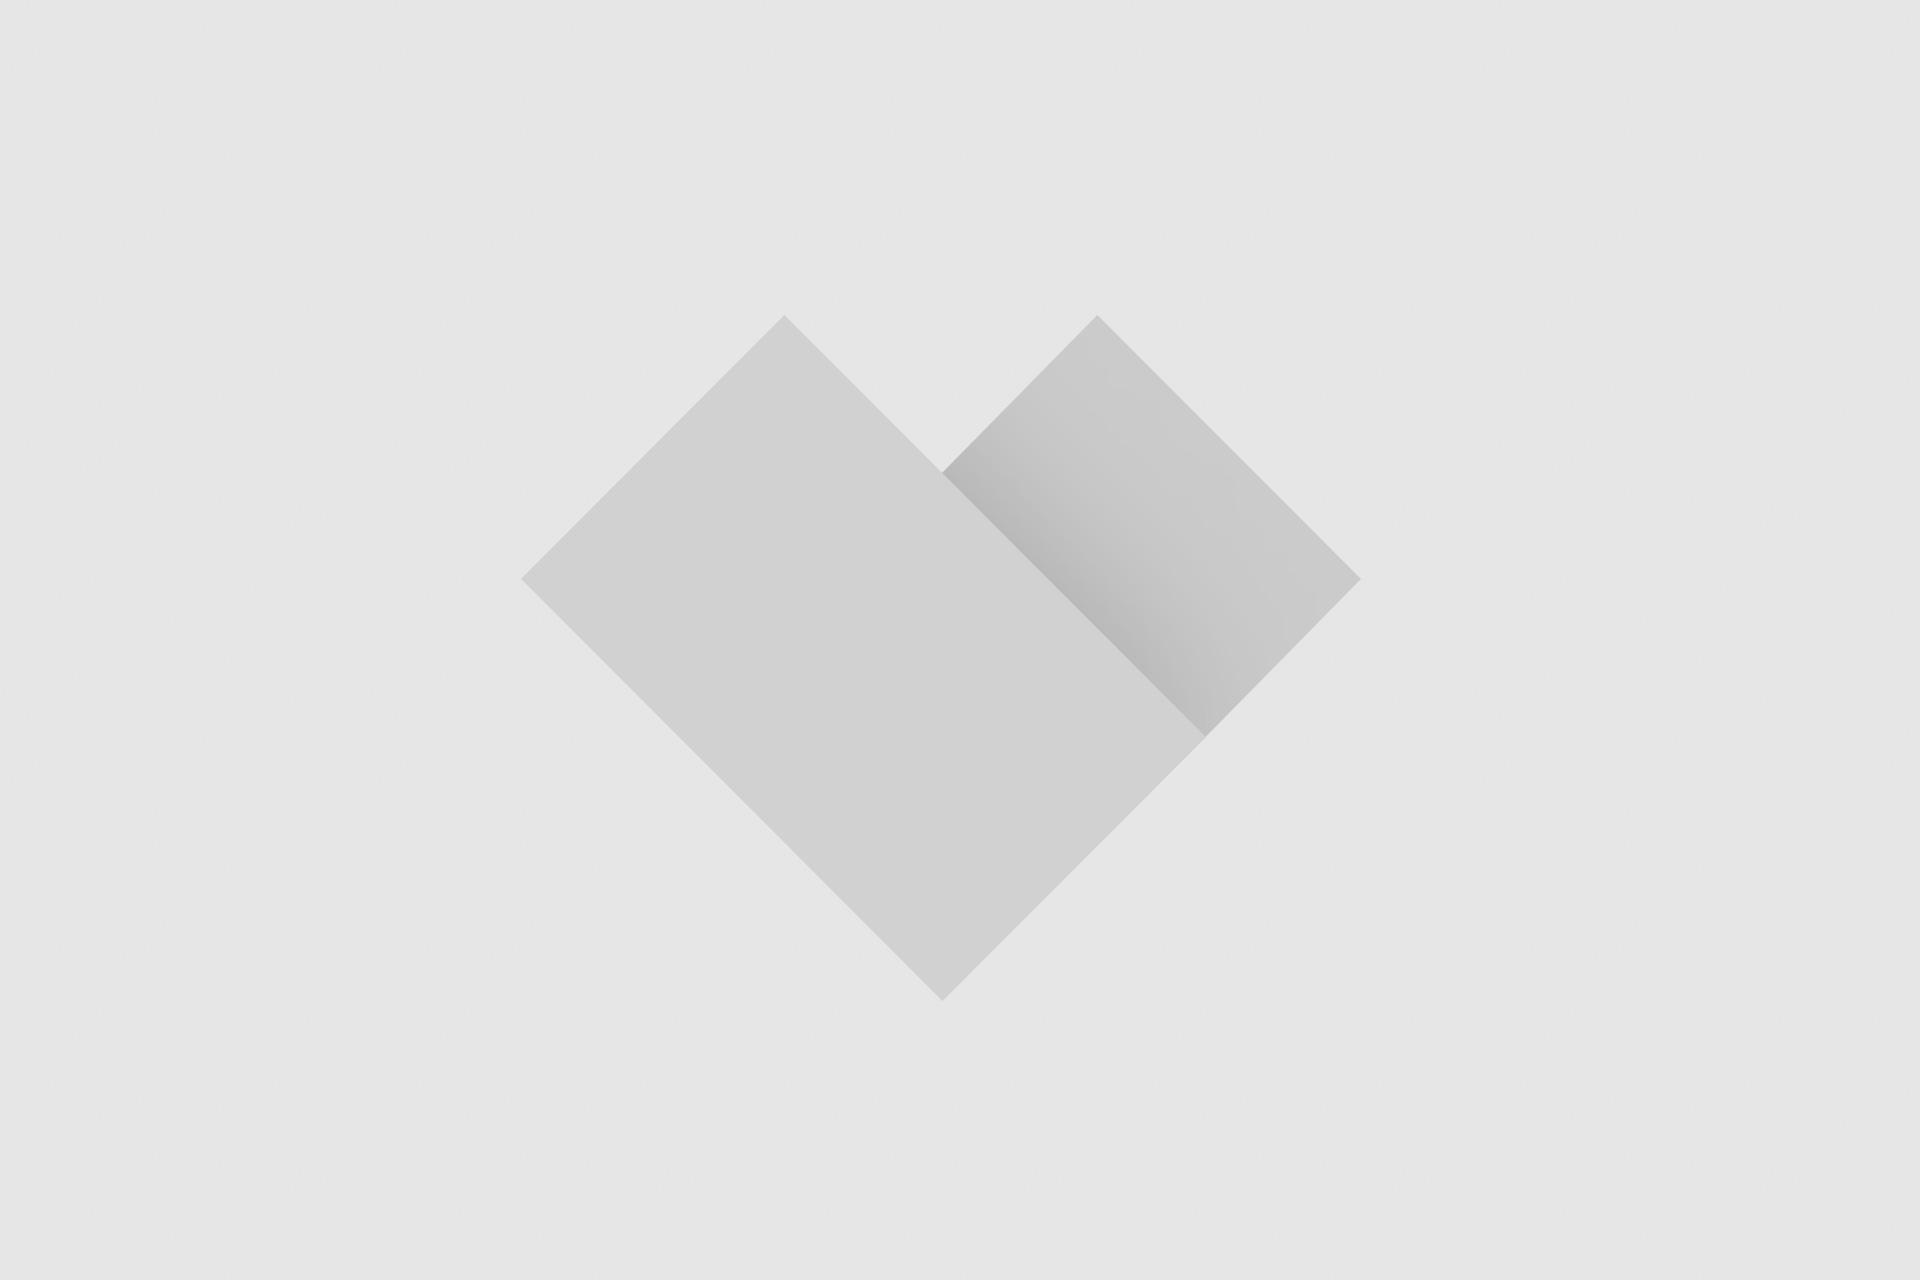 Bestverkochte hoverboards van Intertoys, Media Markt, Bol.com, Blokker en Wehkamp